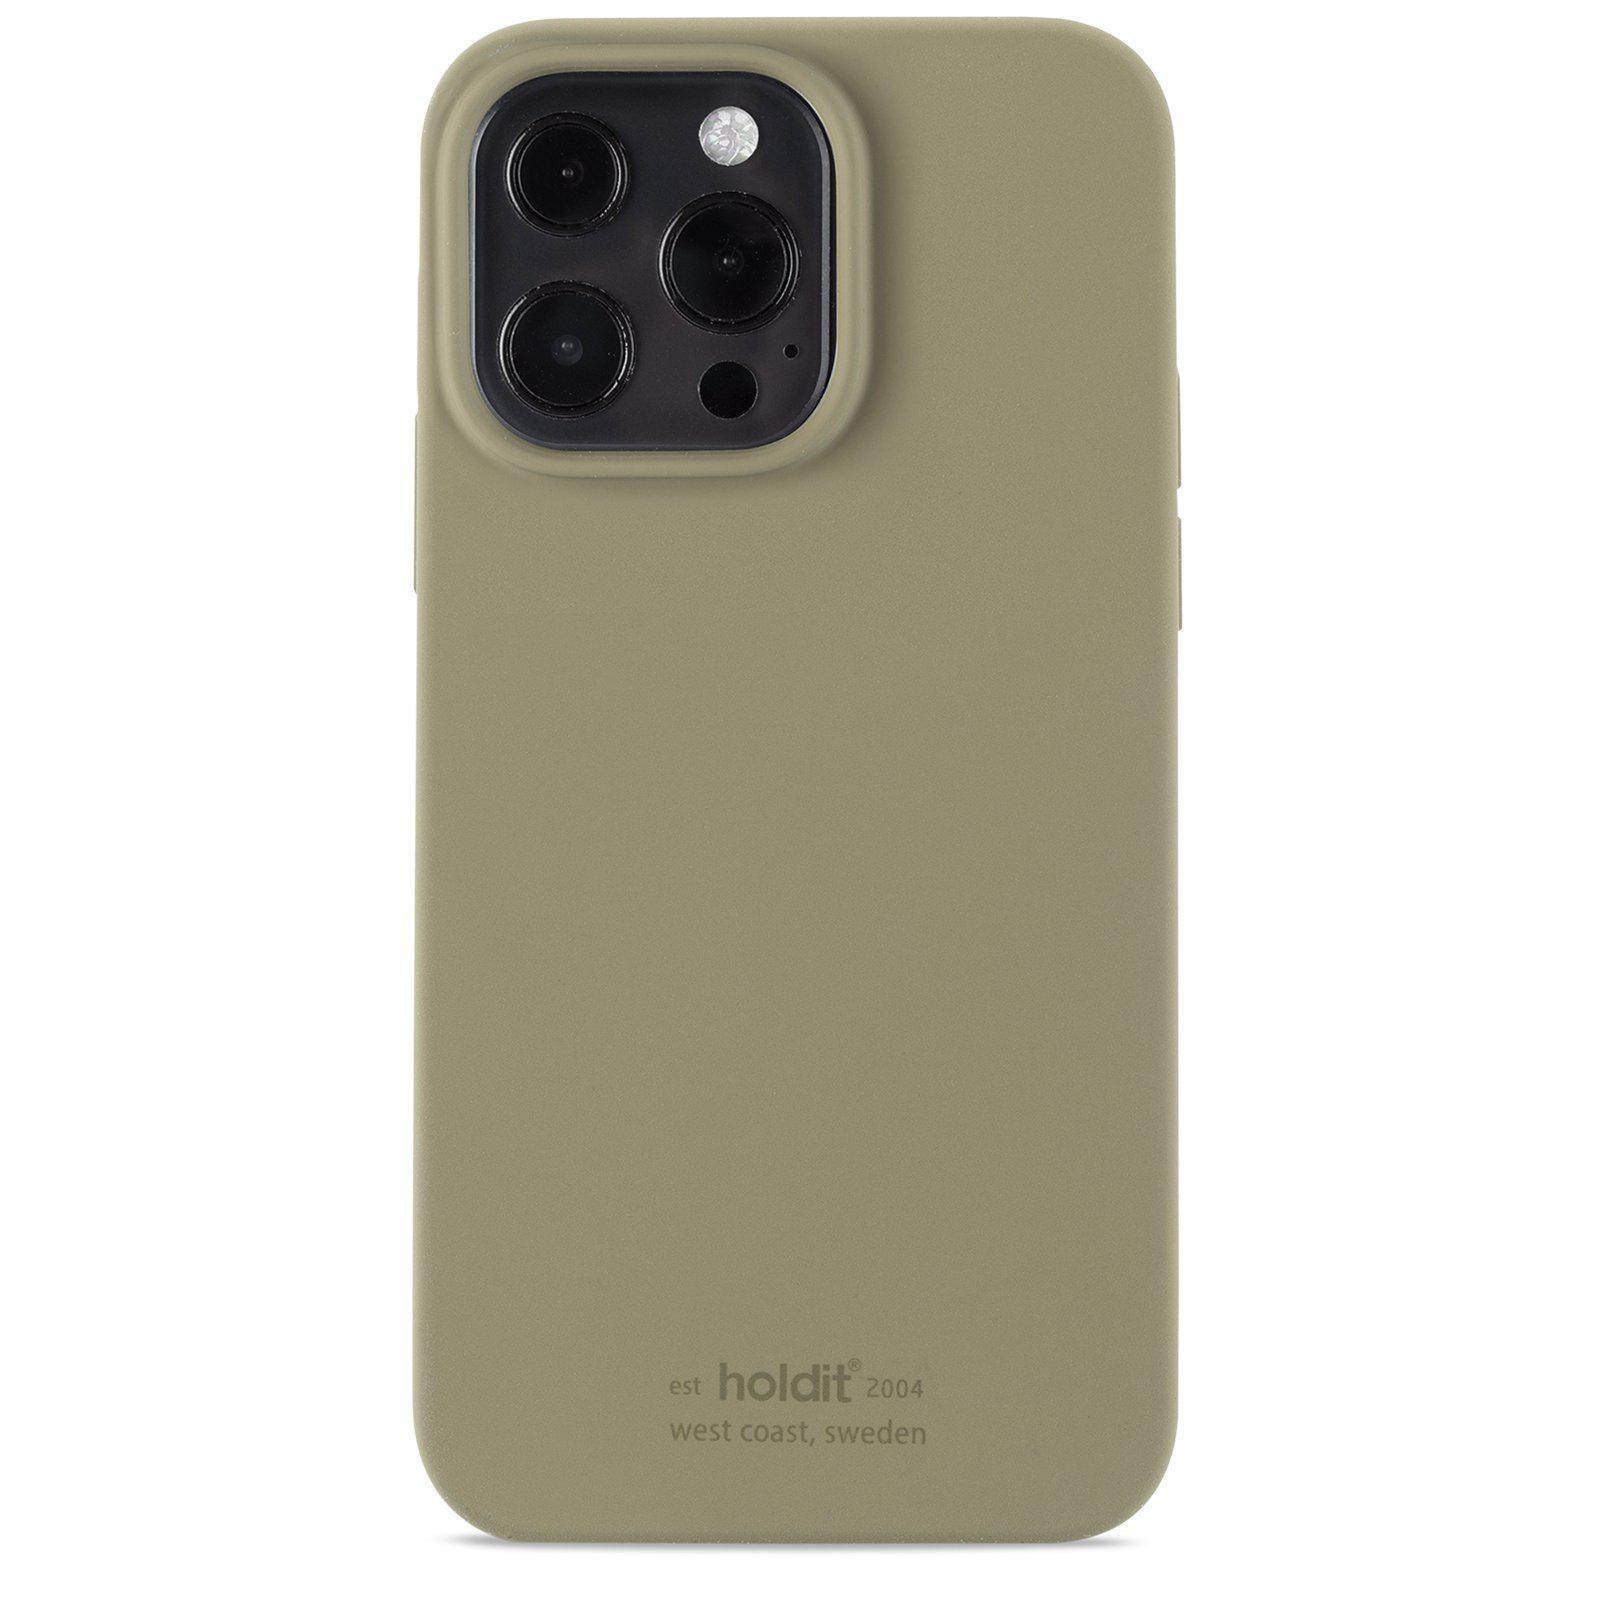 Silikonskal iPhone 13 Pro Khaki Green